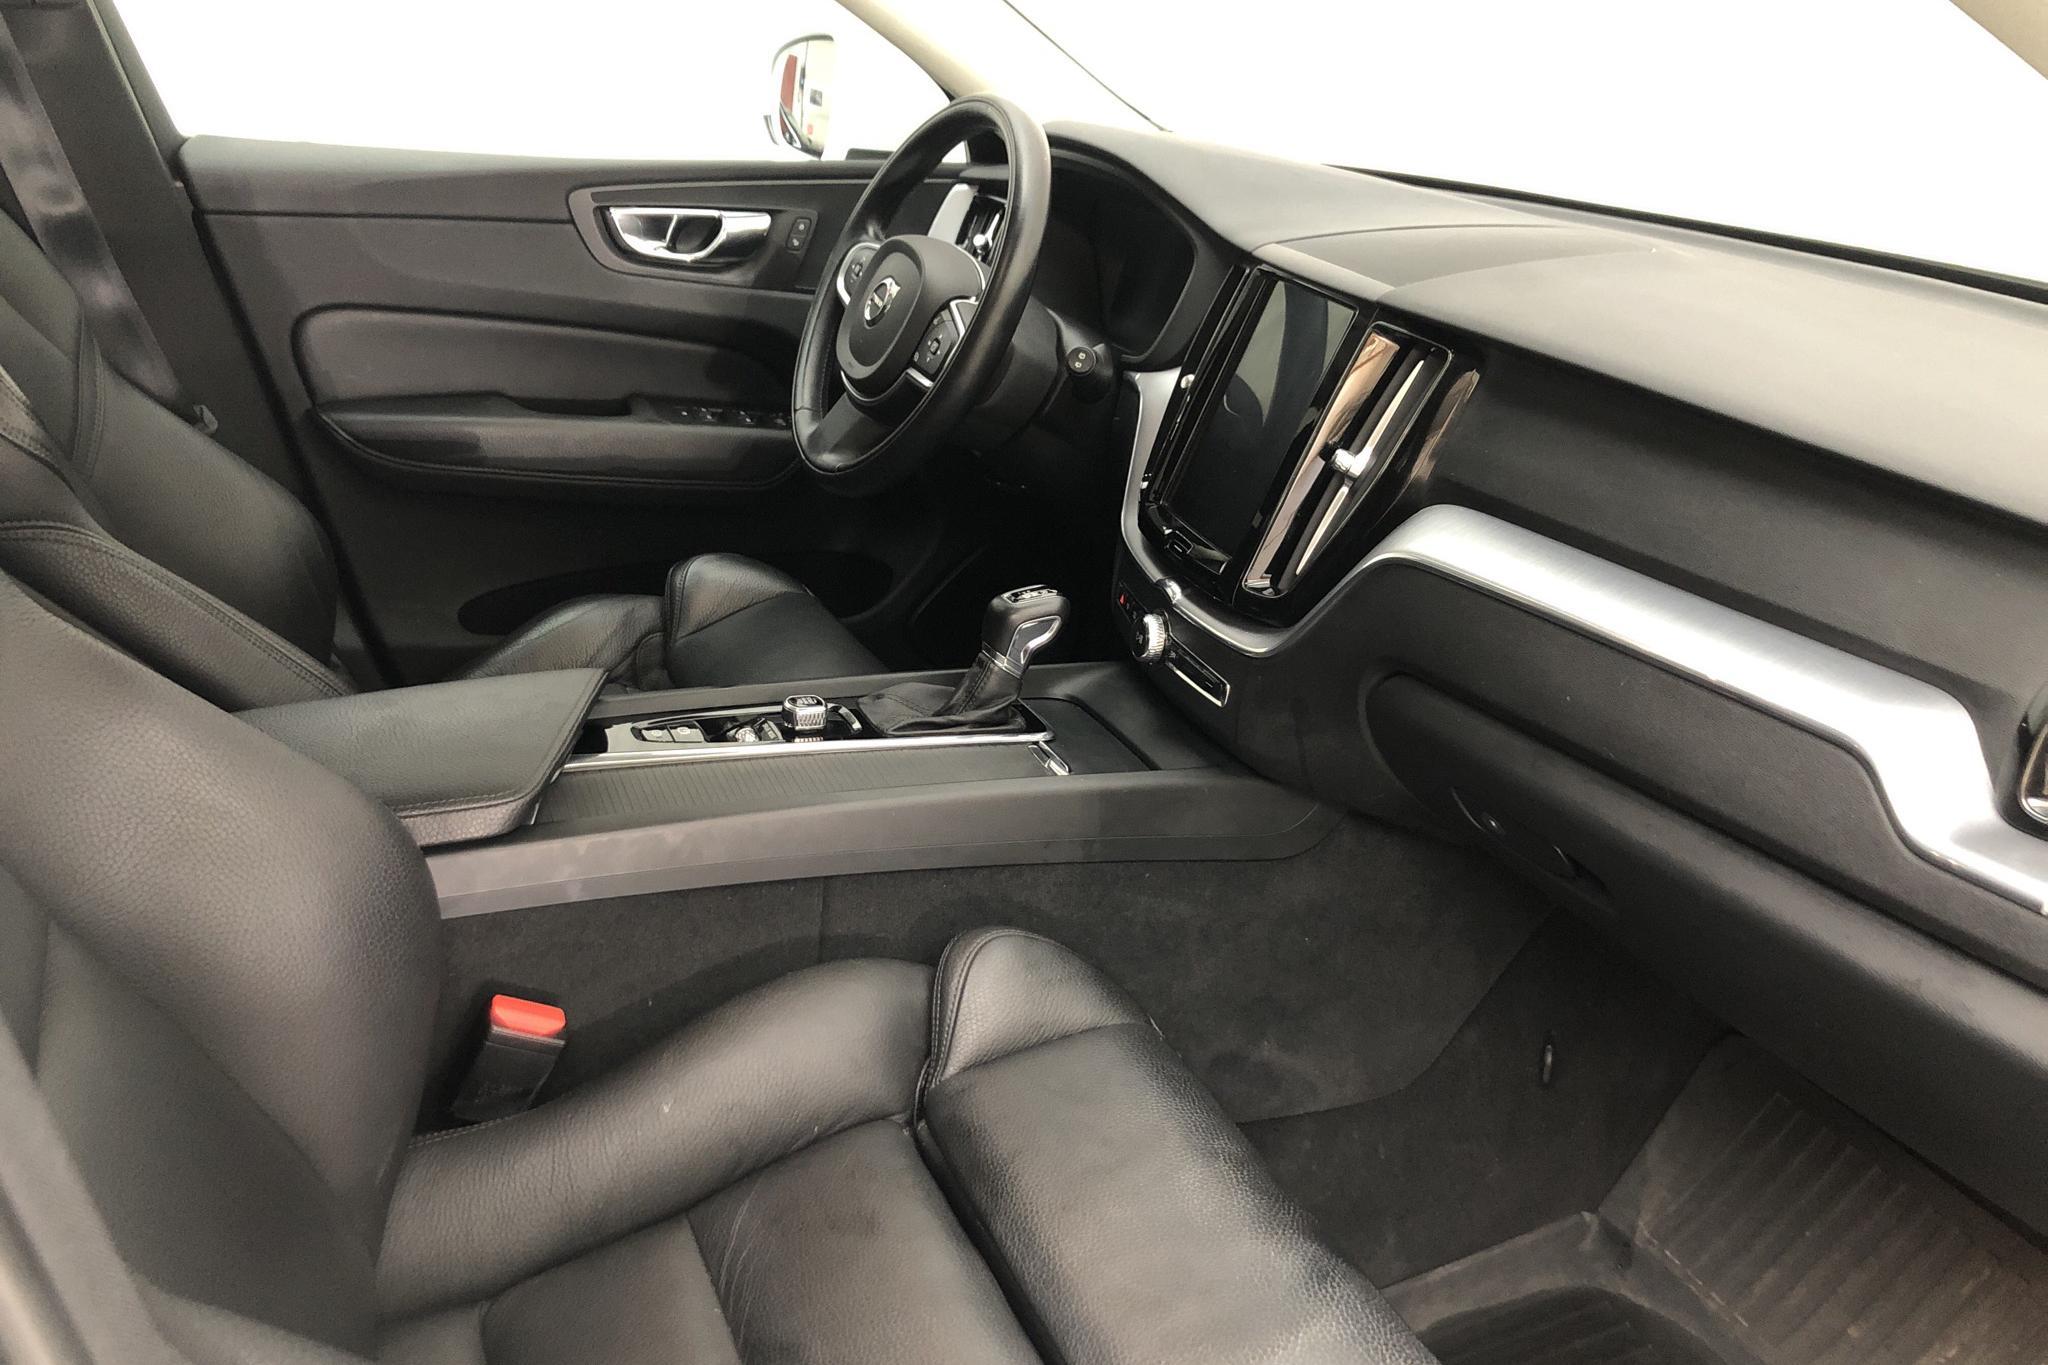 Volvo XC60 T5 2WD (254hk) - 65 490 km - Automatic - white - 2018